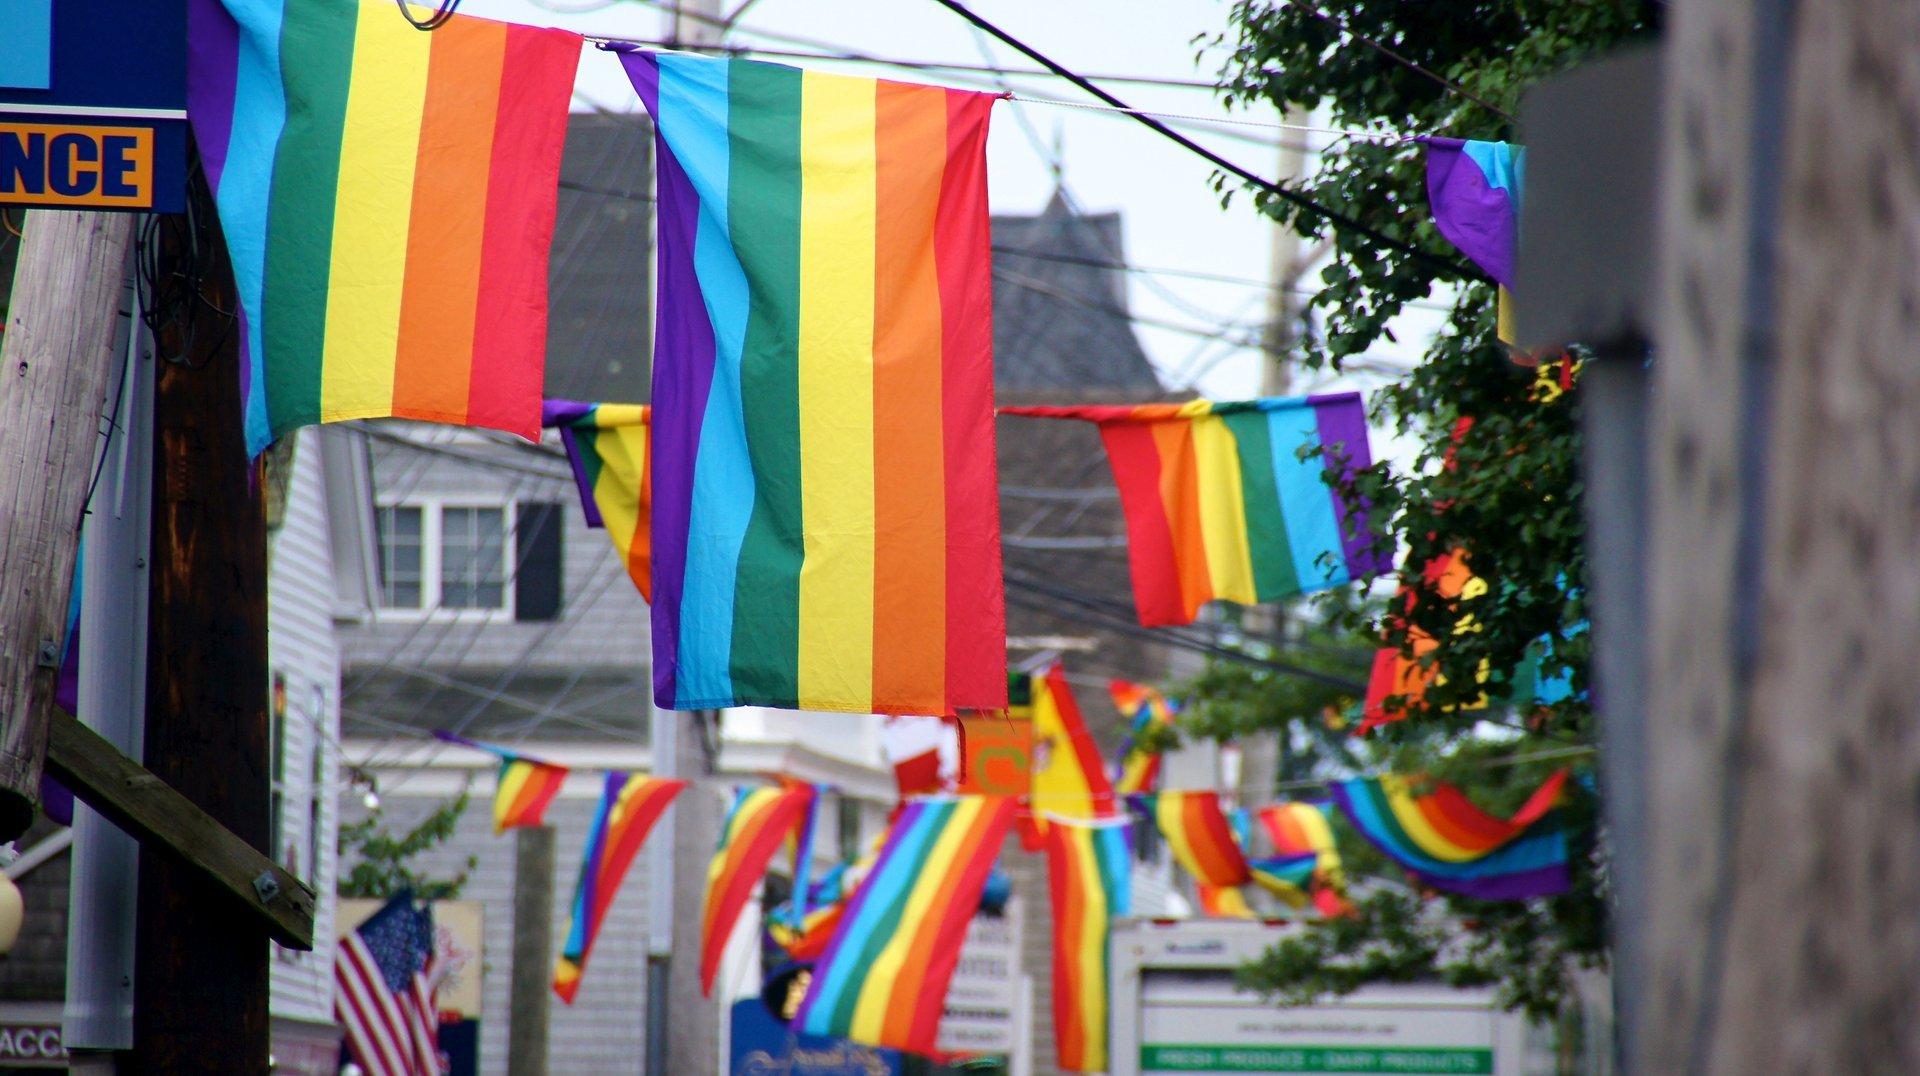 Provincetown Carnival Week in Massachusetts 2020 - Best Time